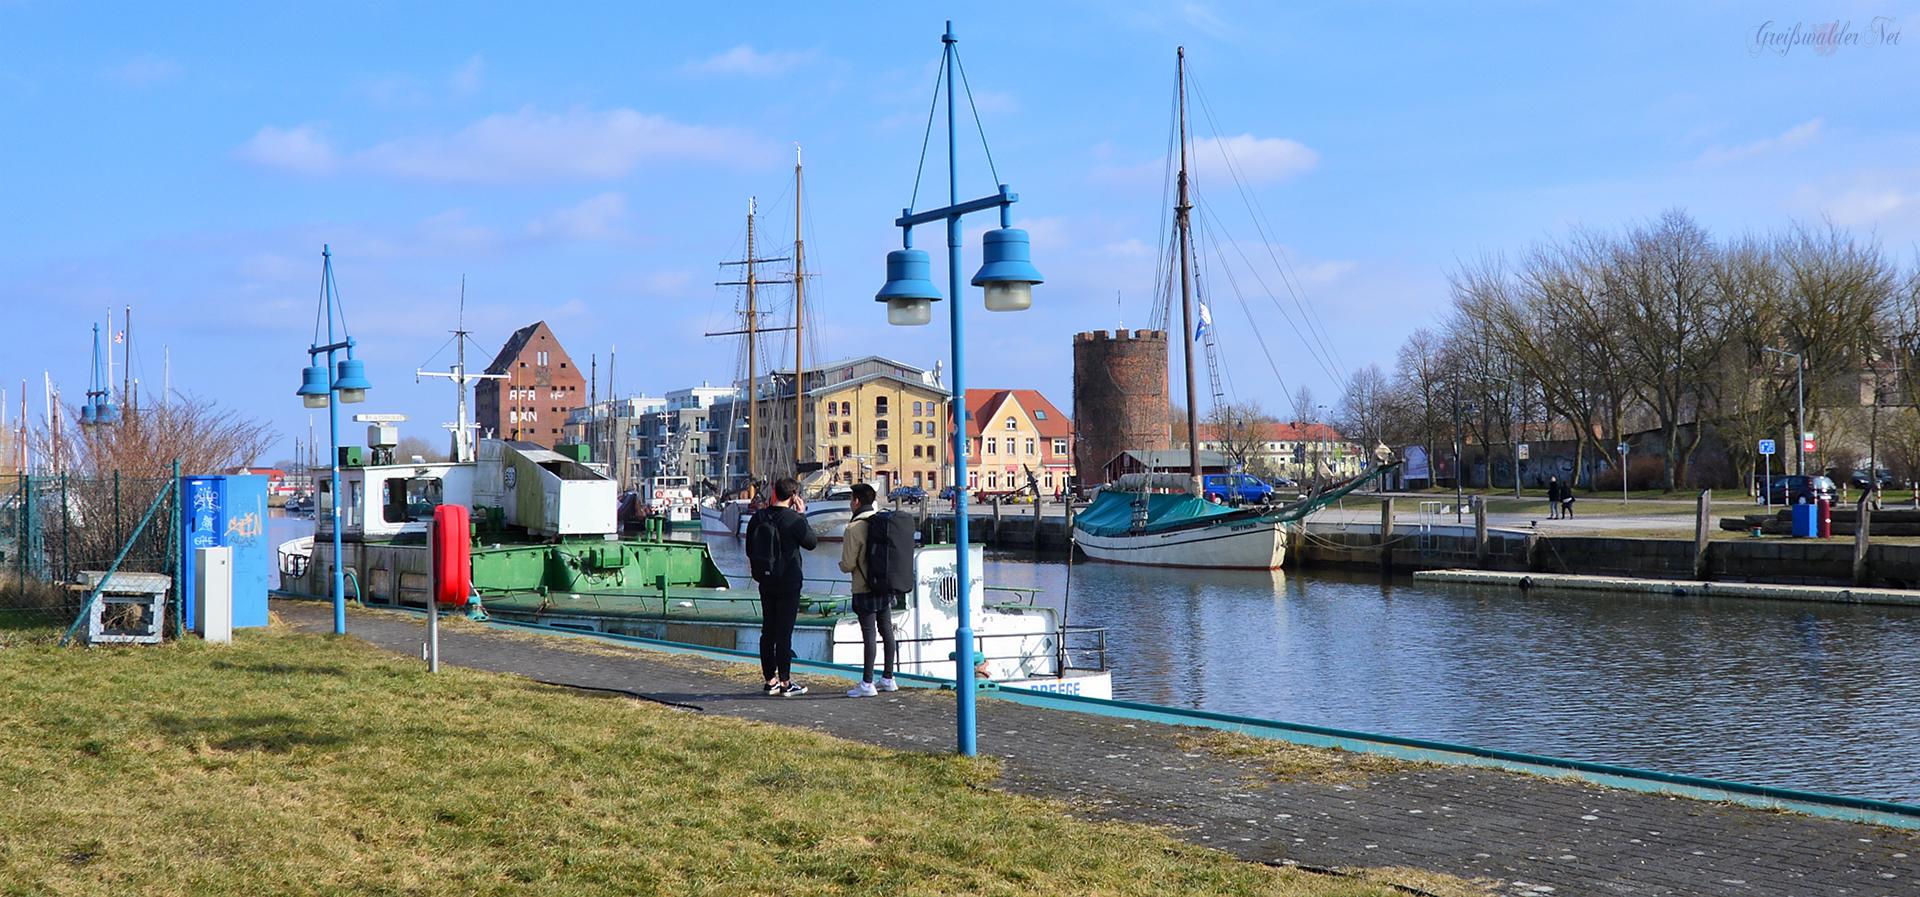 Frühling am Museumshafen in Greifswald